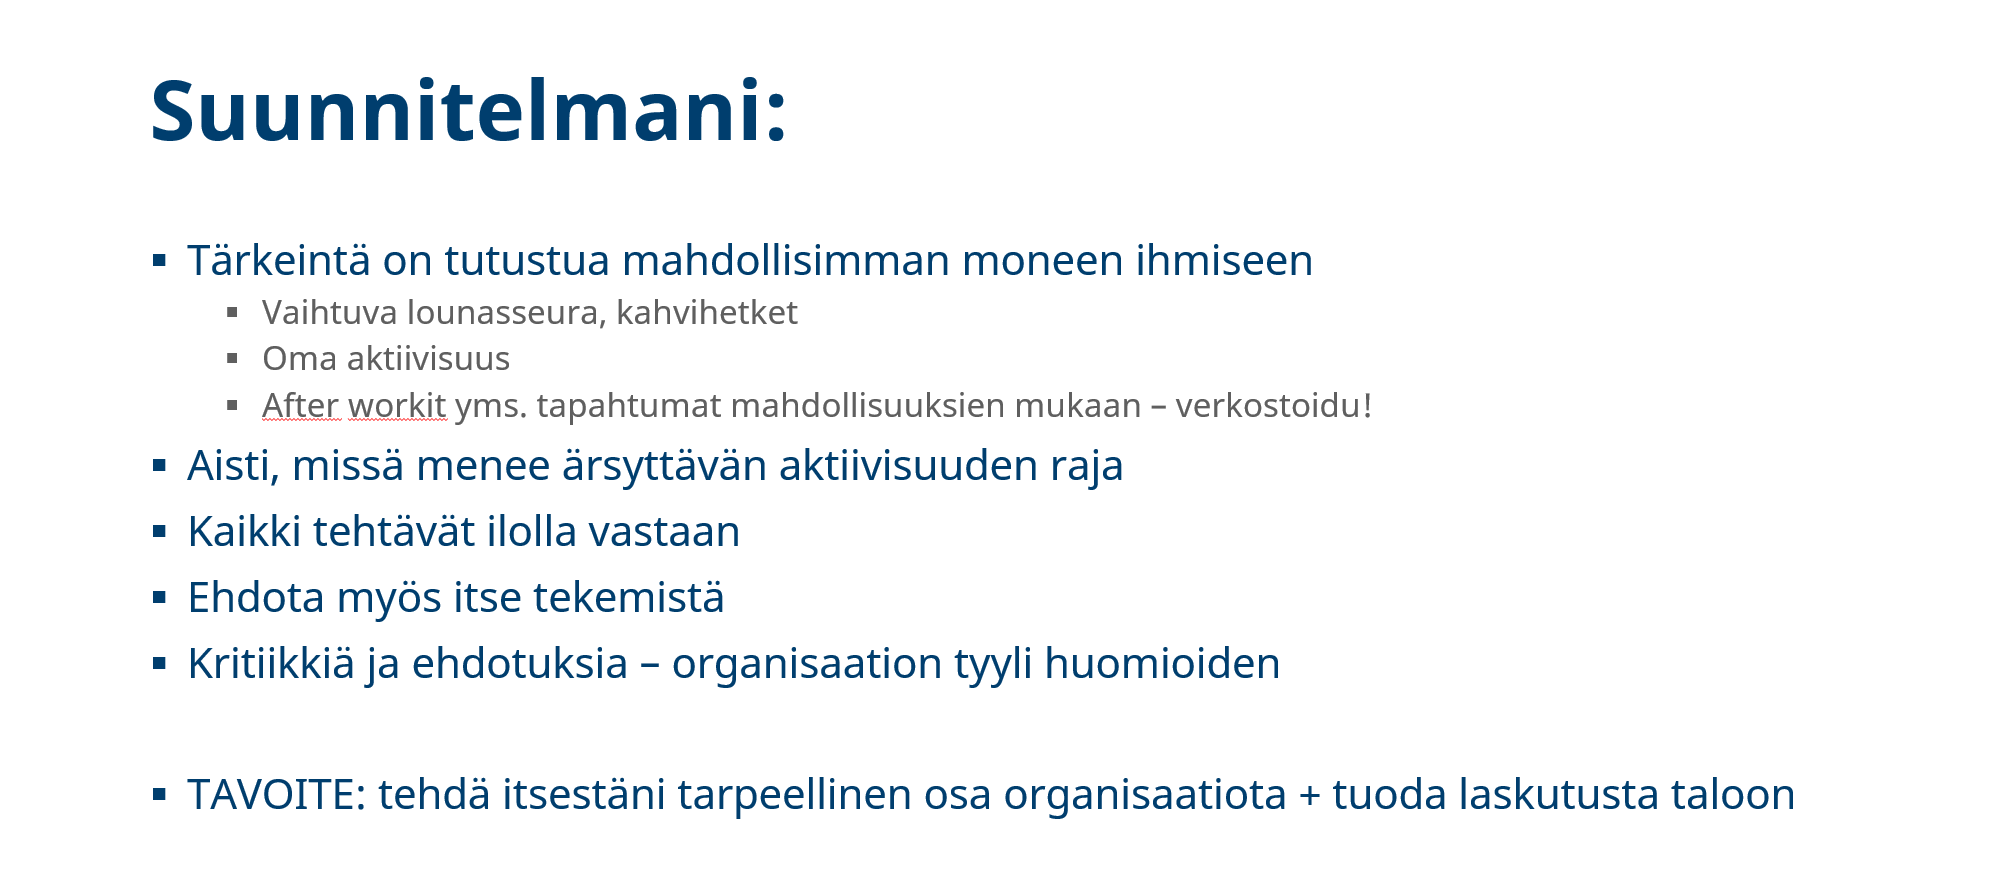 piilo_osaajat_suunnitelmani.png